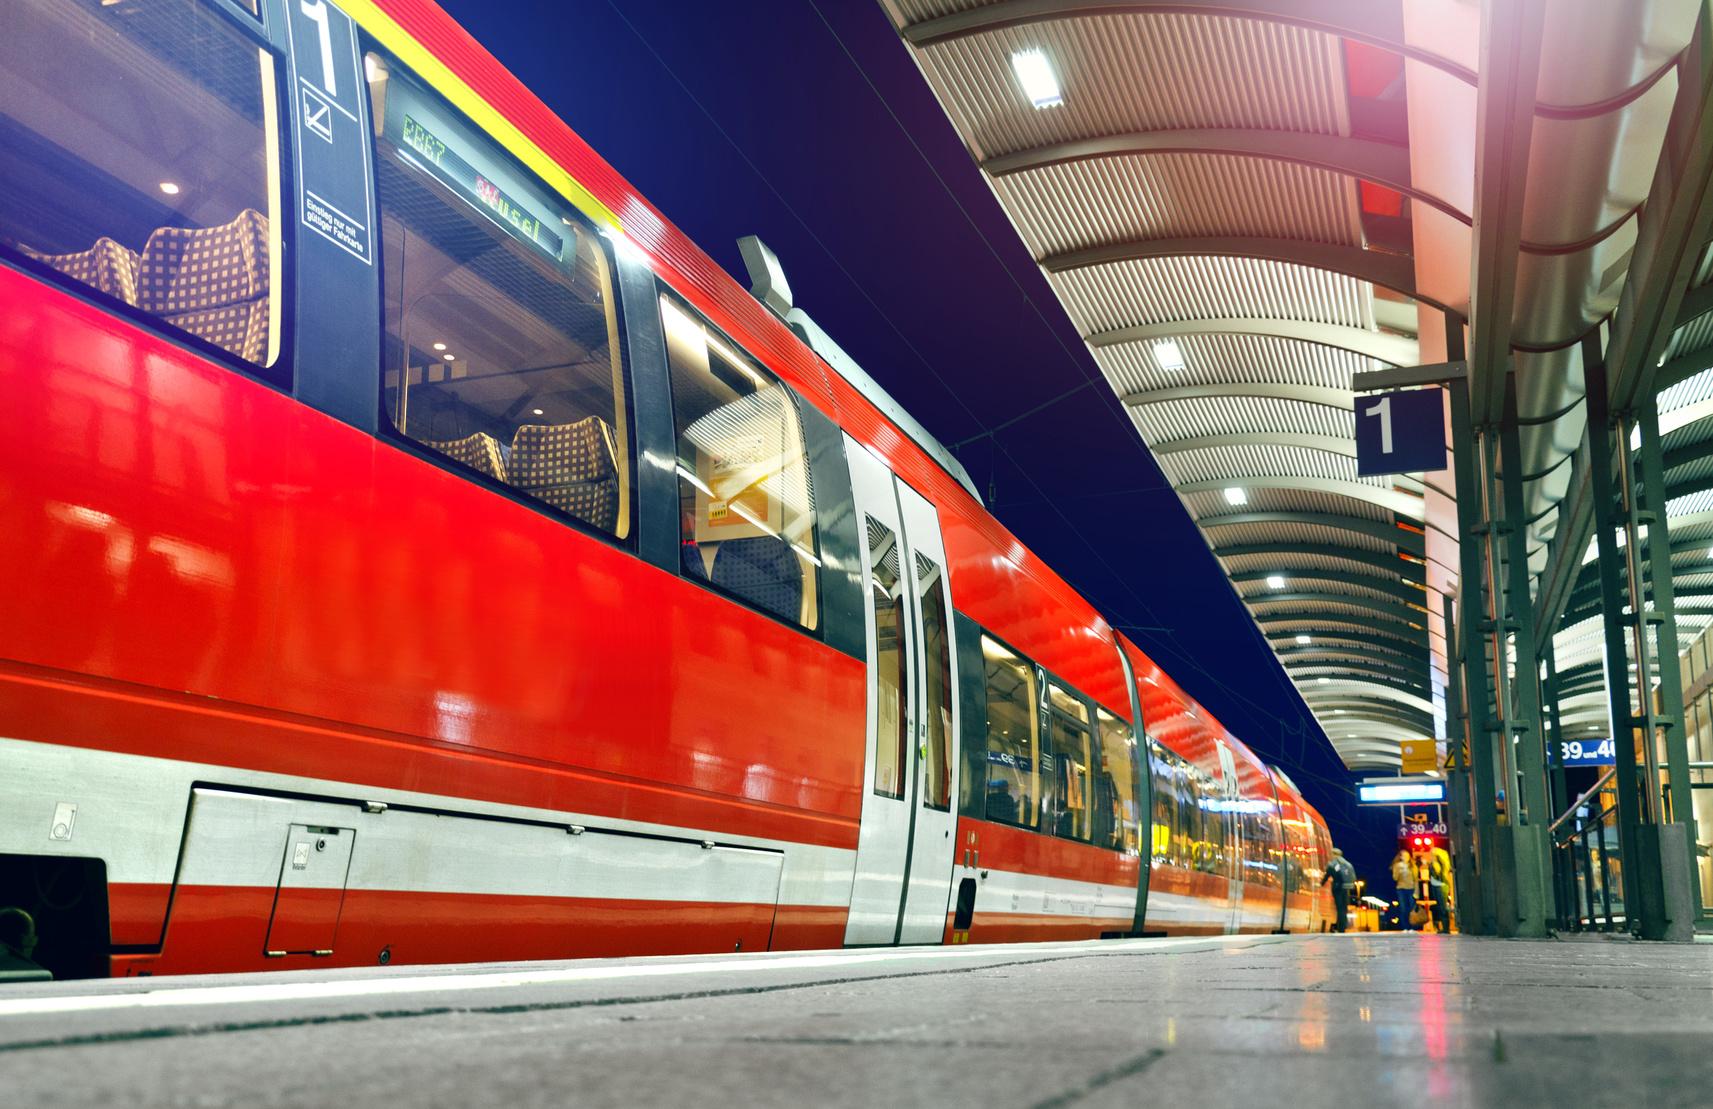 Münchner S-Bahn-Fahrer onanierte vor den Fahrgästen